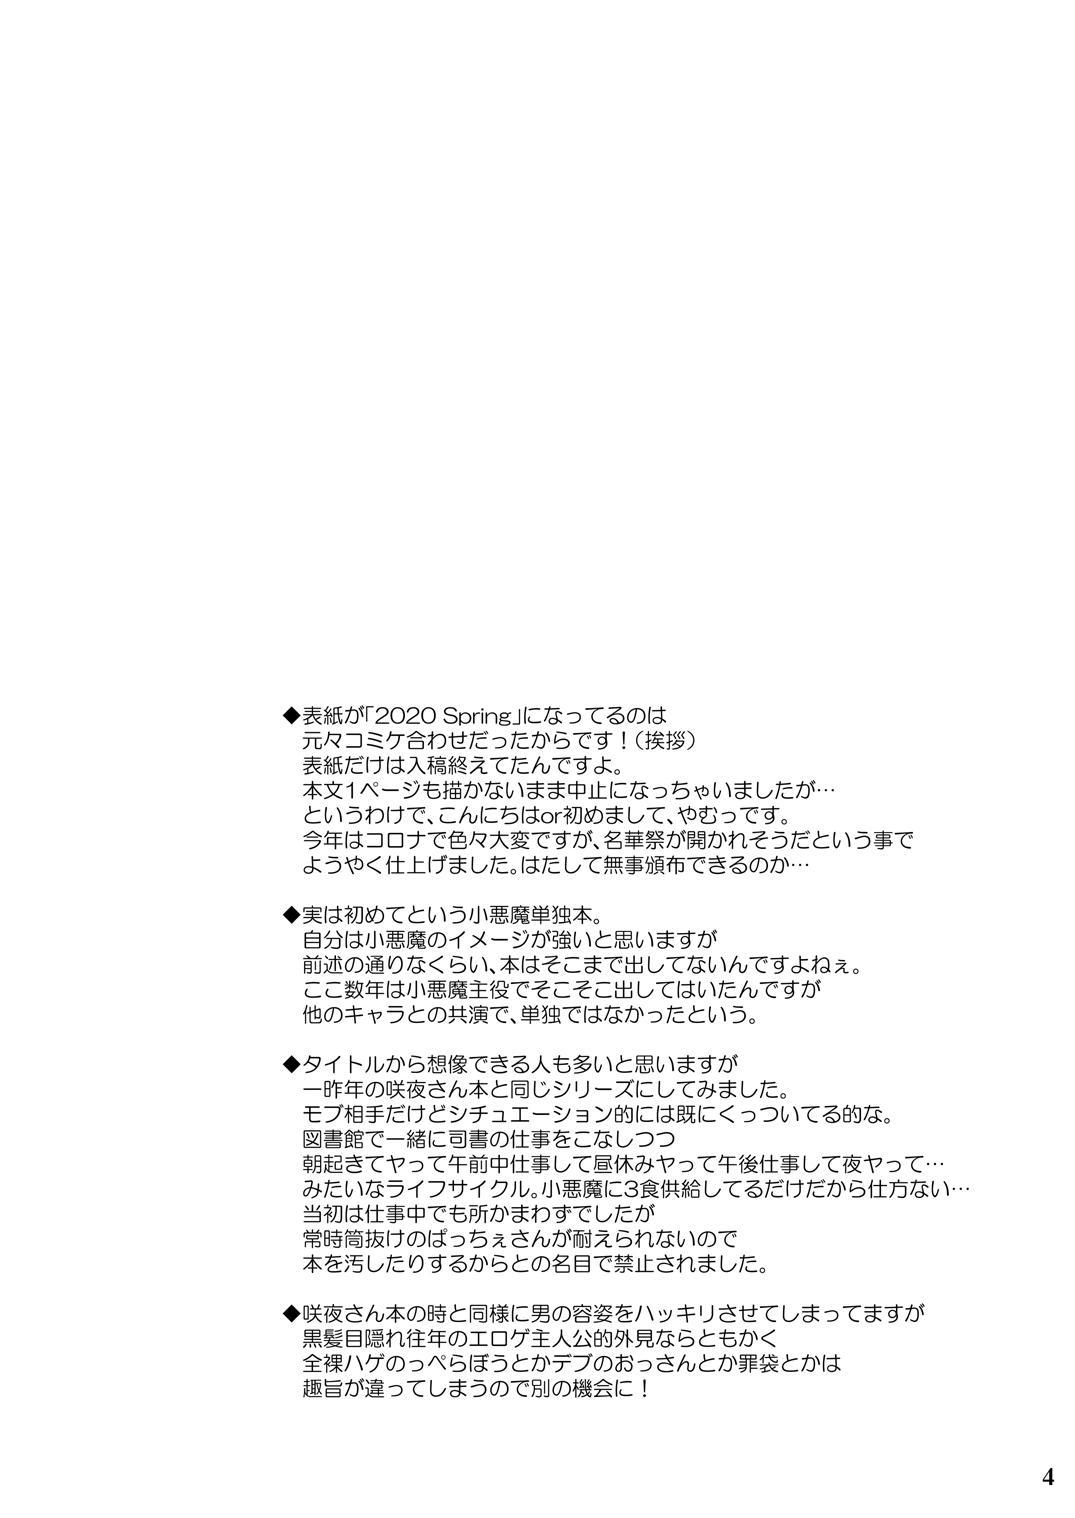 Juusha no Tame no Nocturne 2